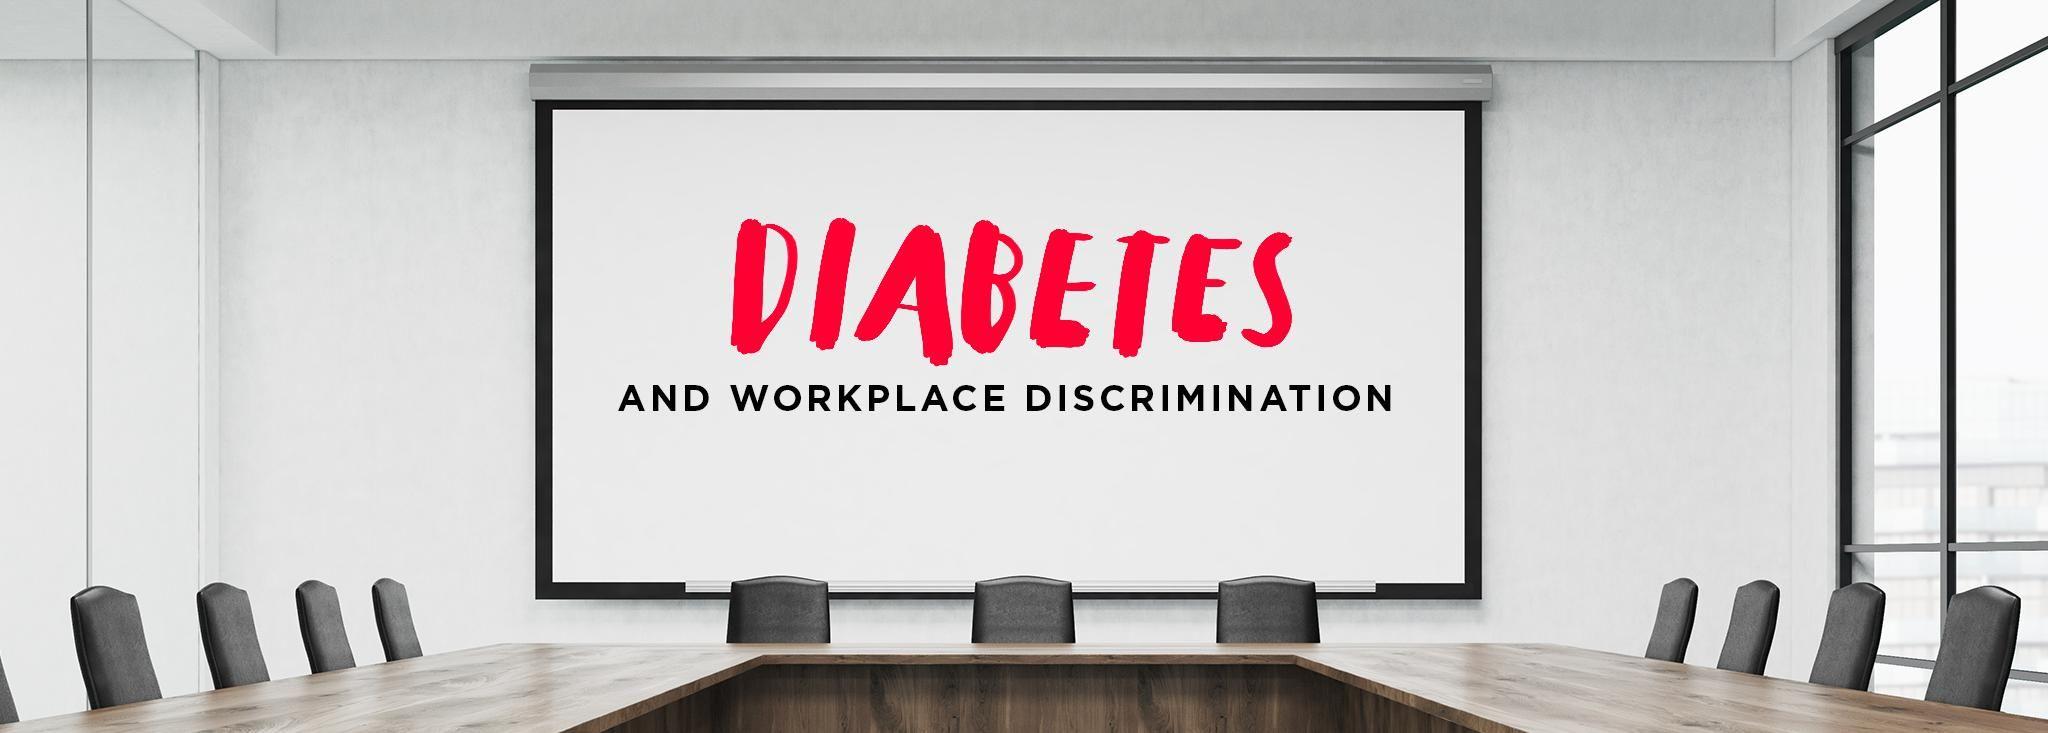 Diabetes Workplace Discrimination